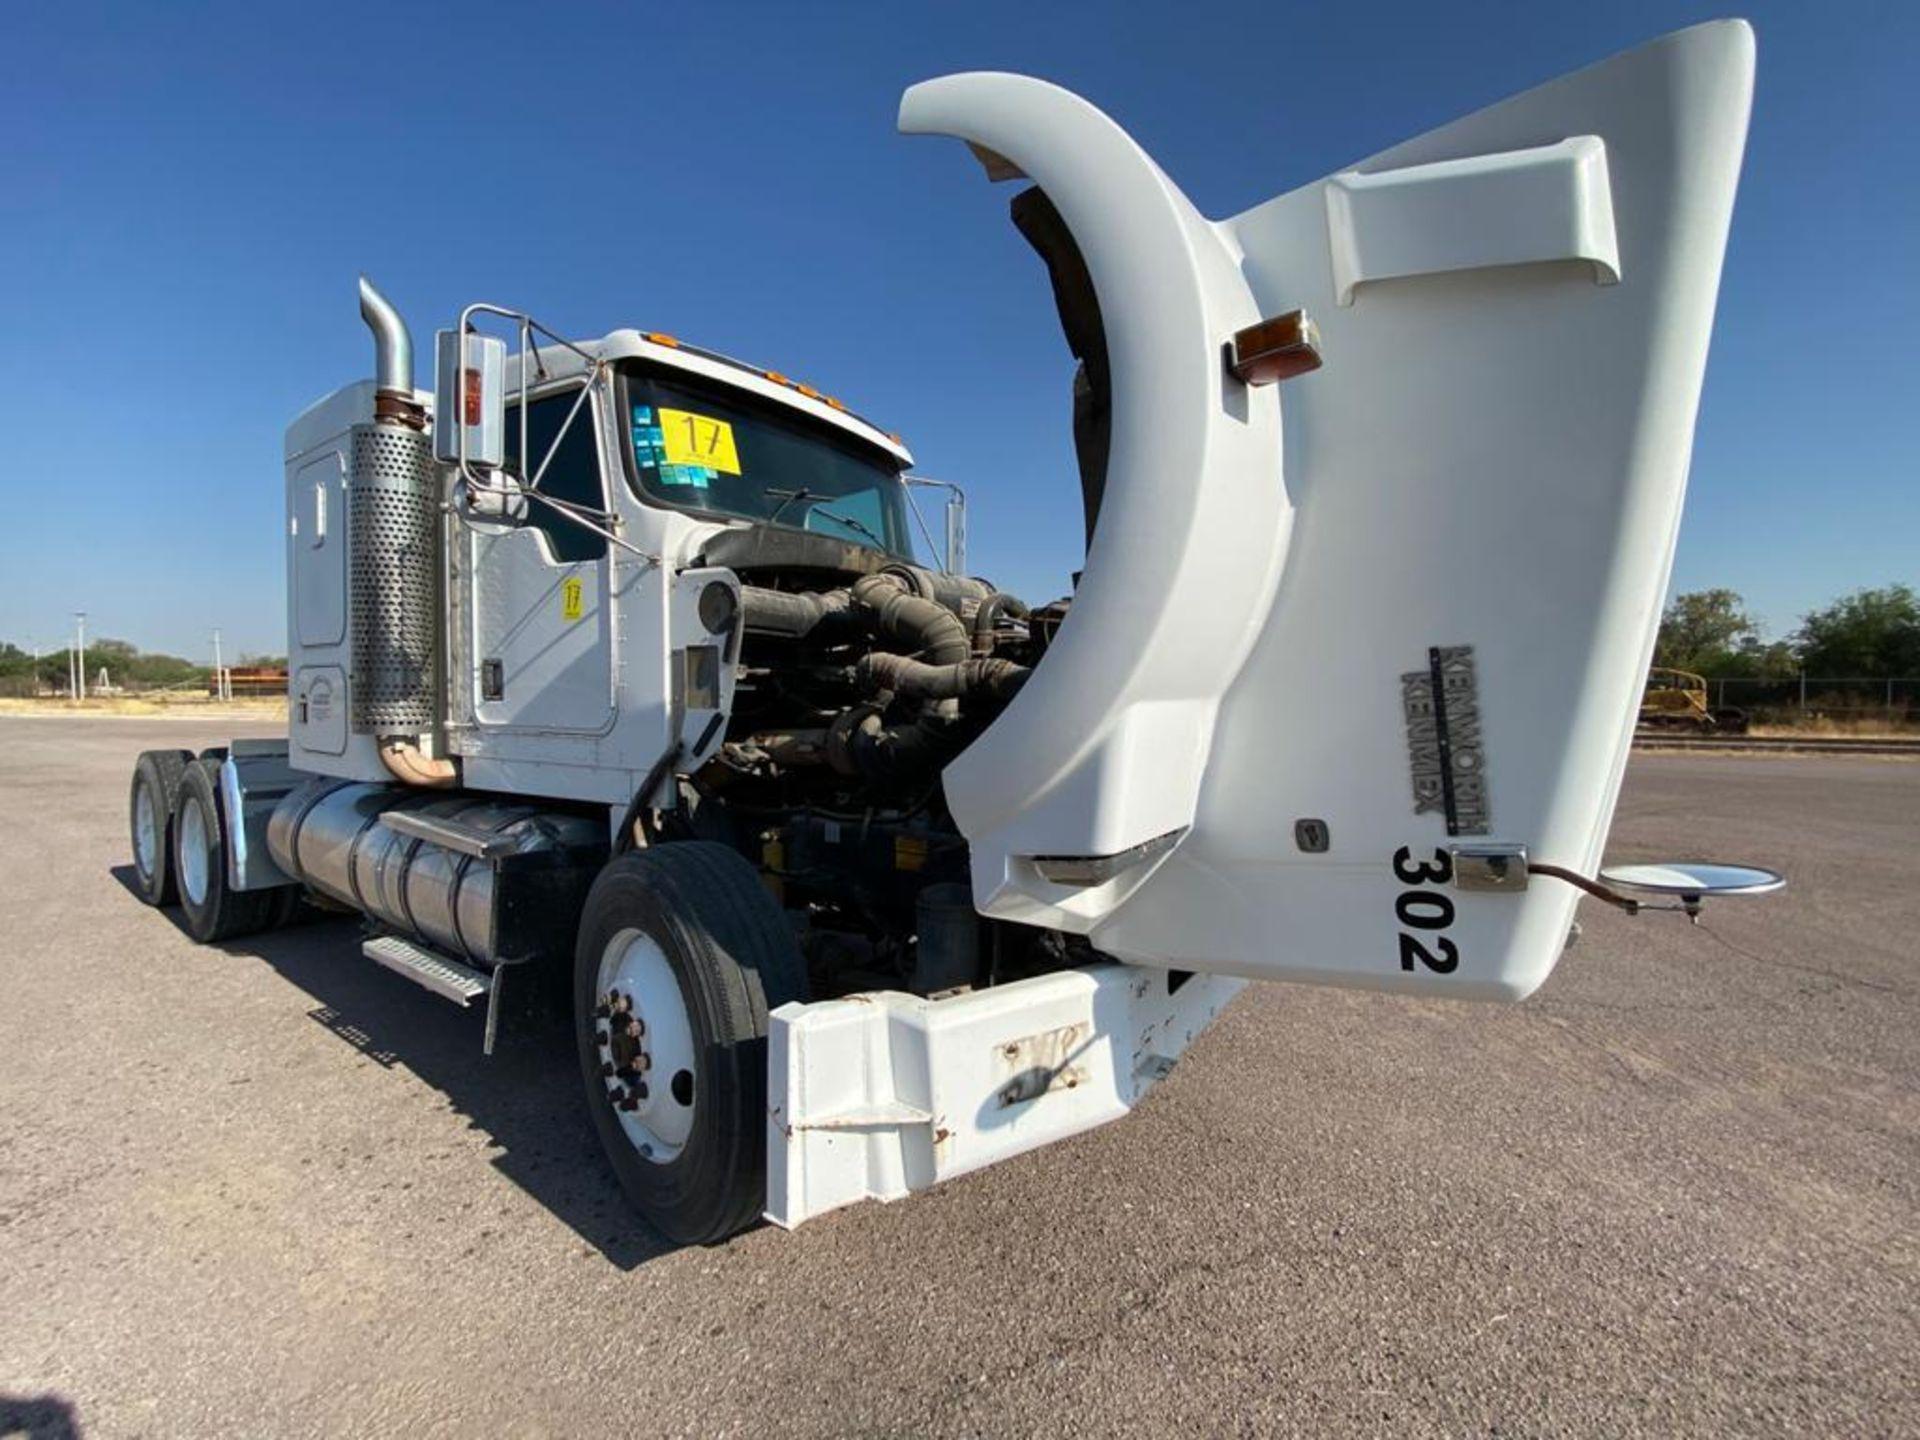 1998 Kenworth Sleeper Truck Tractor, standard transmission of 18 speeds - Image 41 of 55